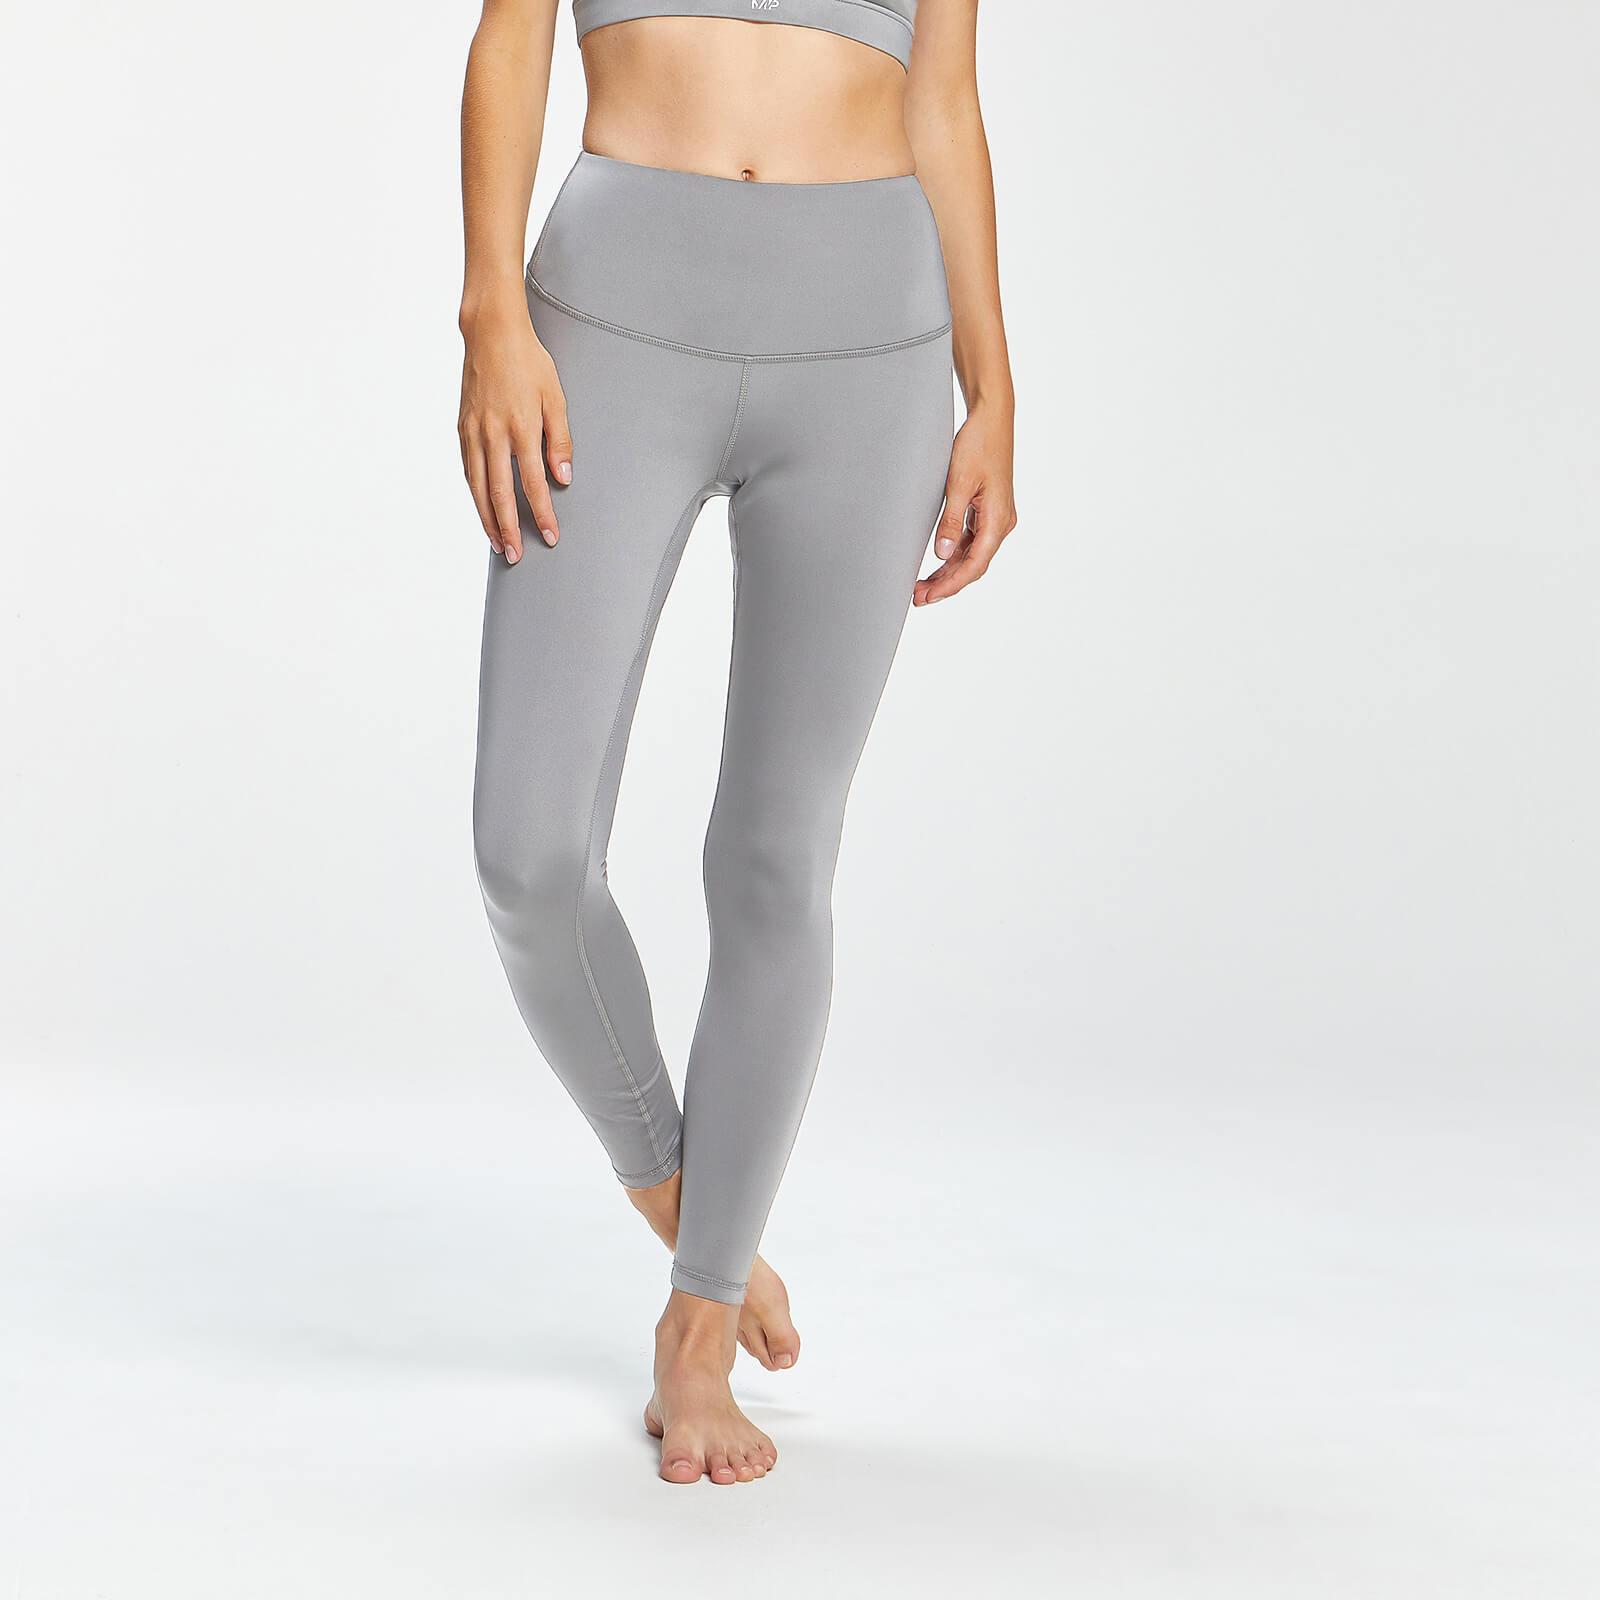 Купить MP Women's Composure Leggings - Chrome Marl - XXS, Myprotein International